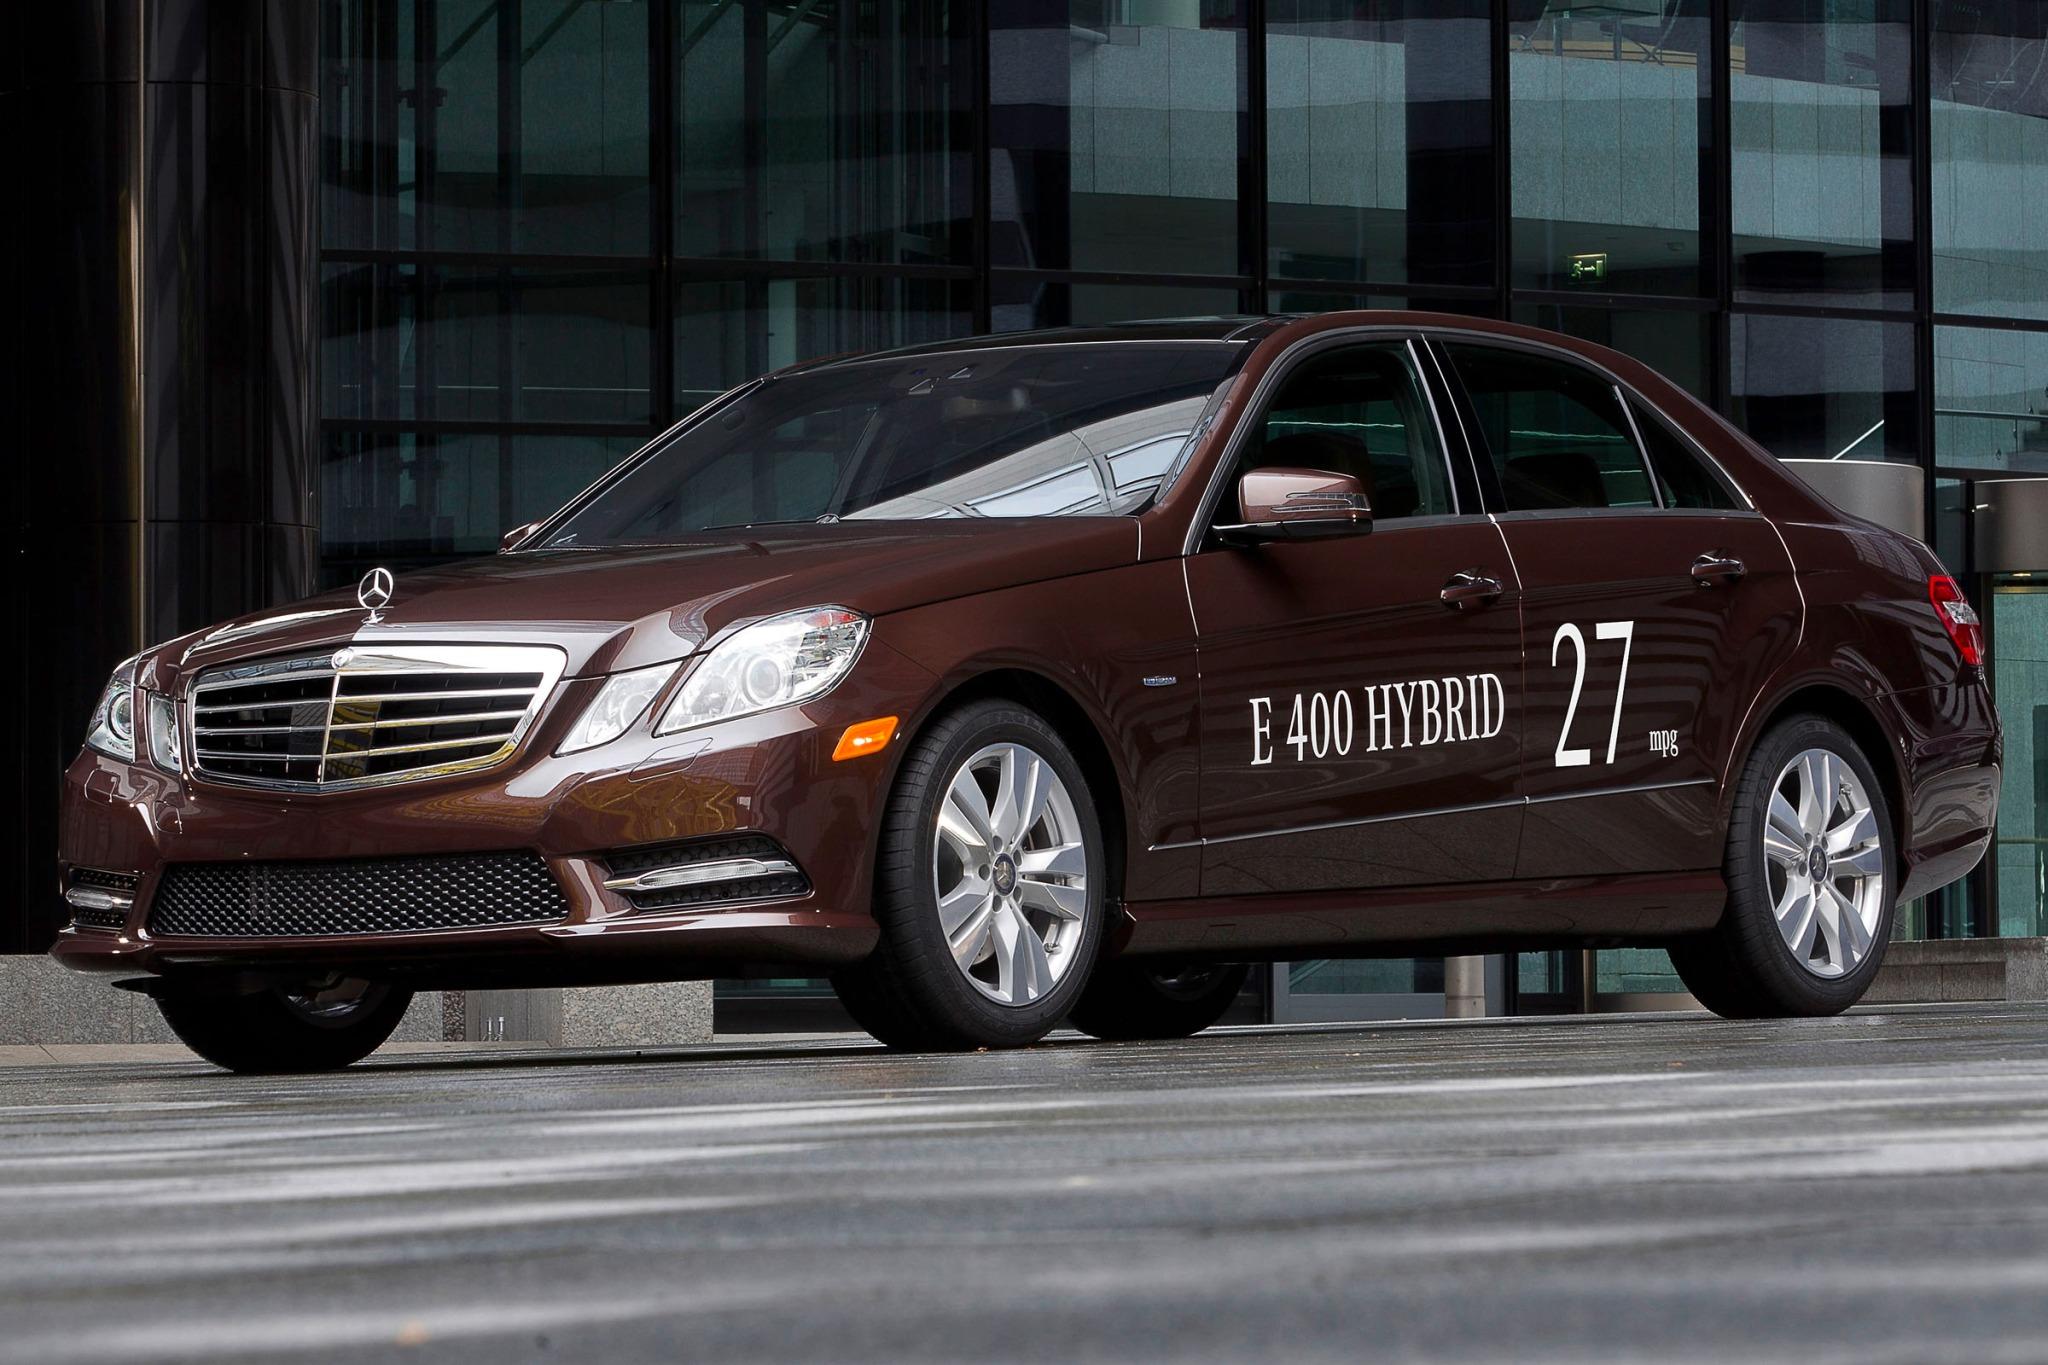 2013 mercedes benz e class sedan e400 hybrid fq oem 3 2048